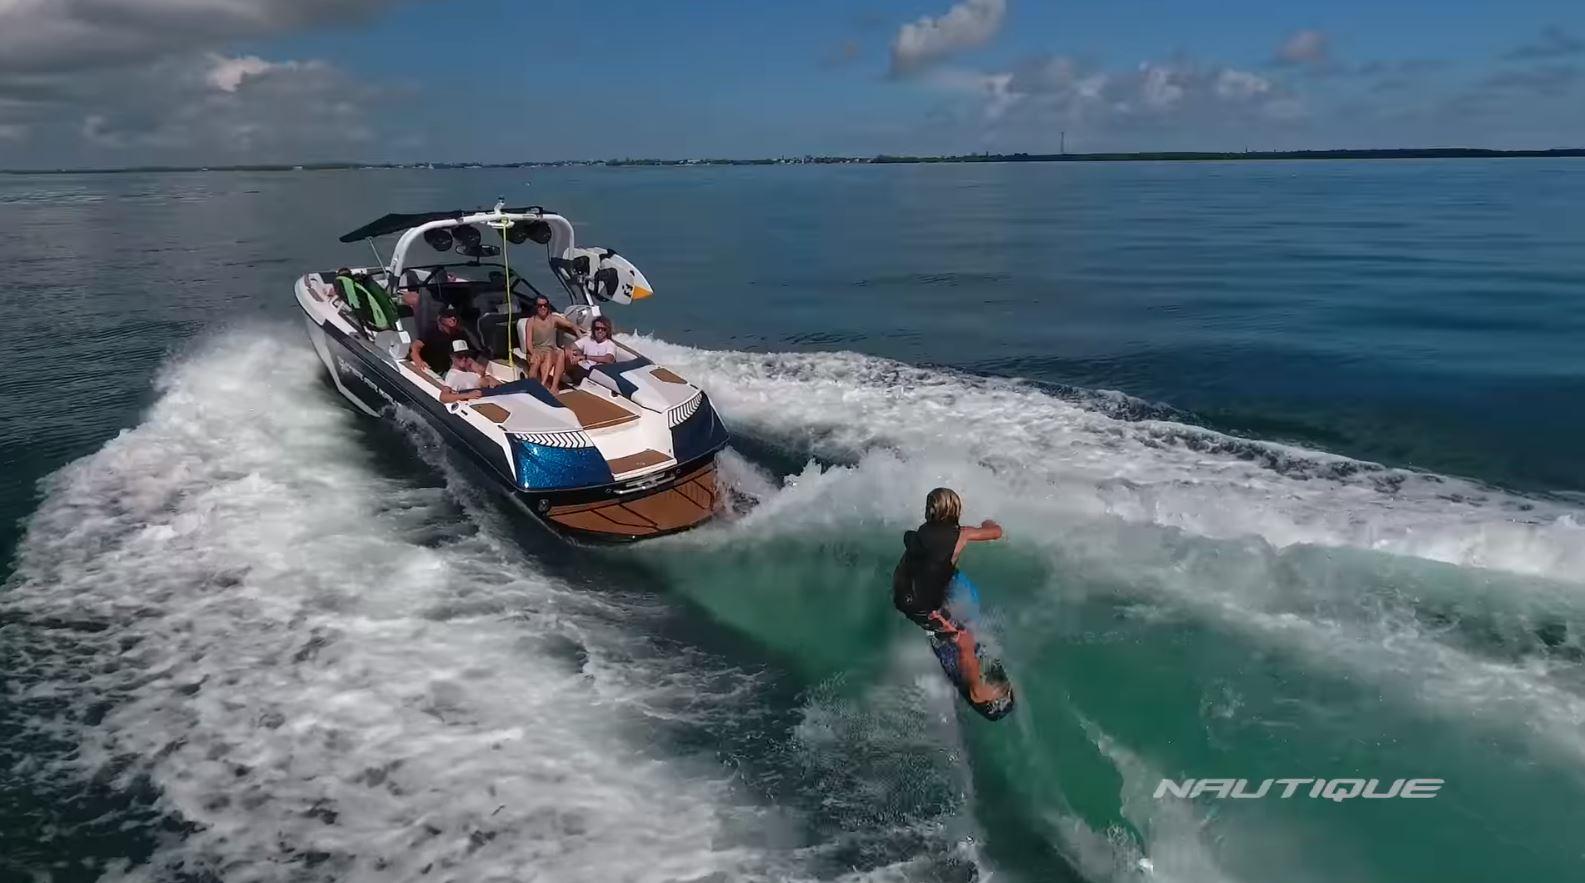 person waterskiing behind boat